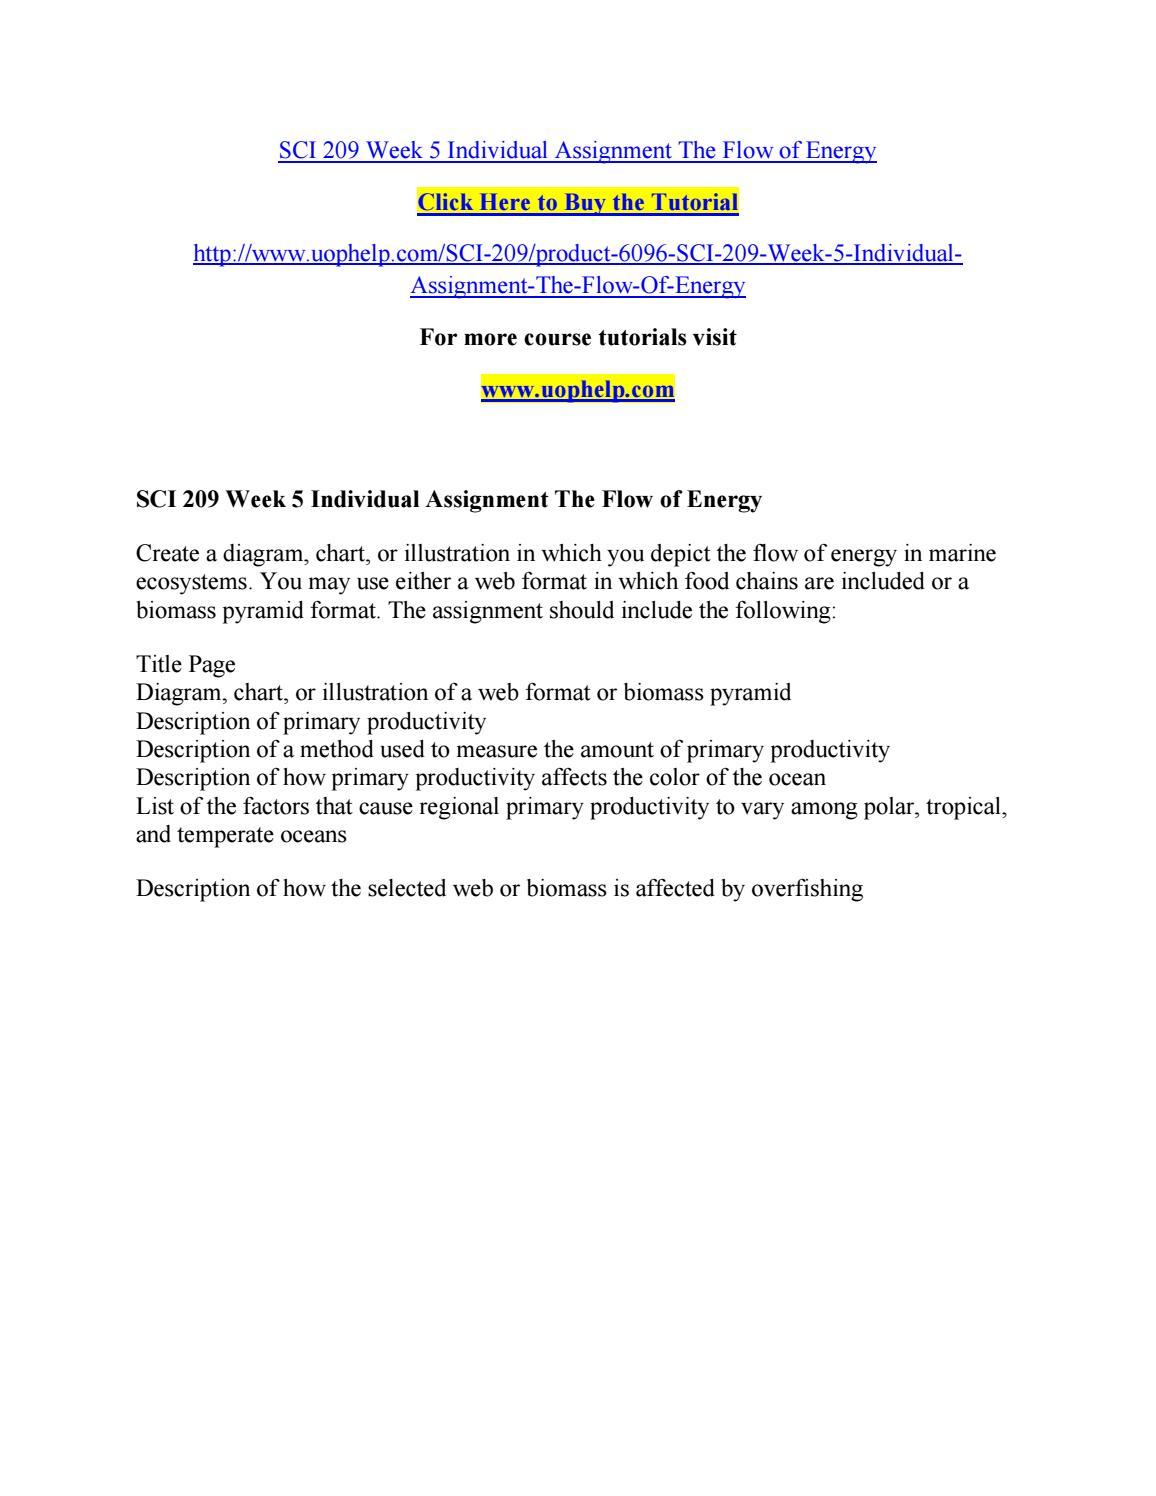 essay for application university common